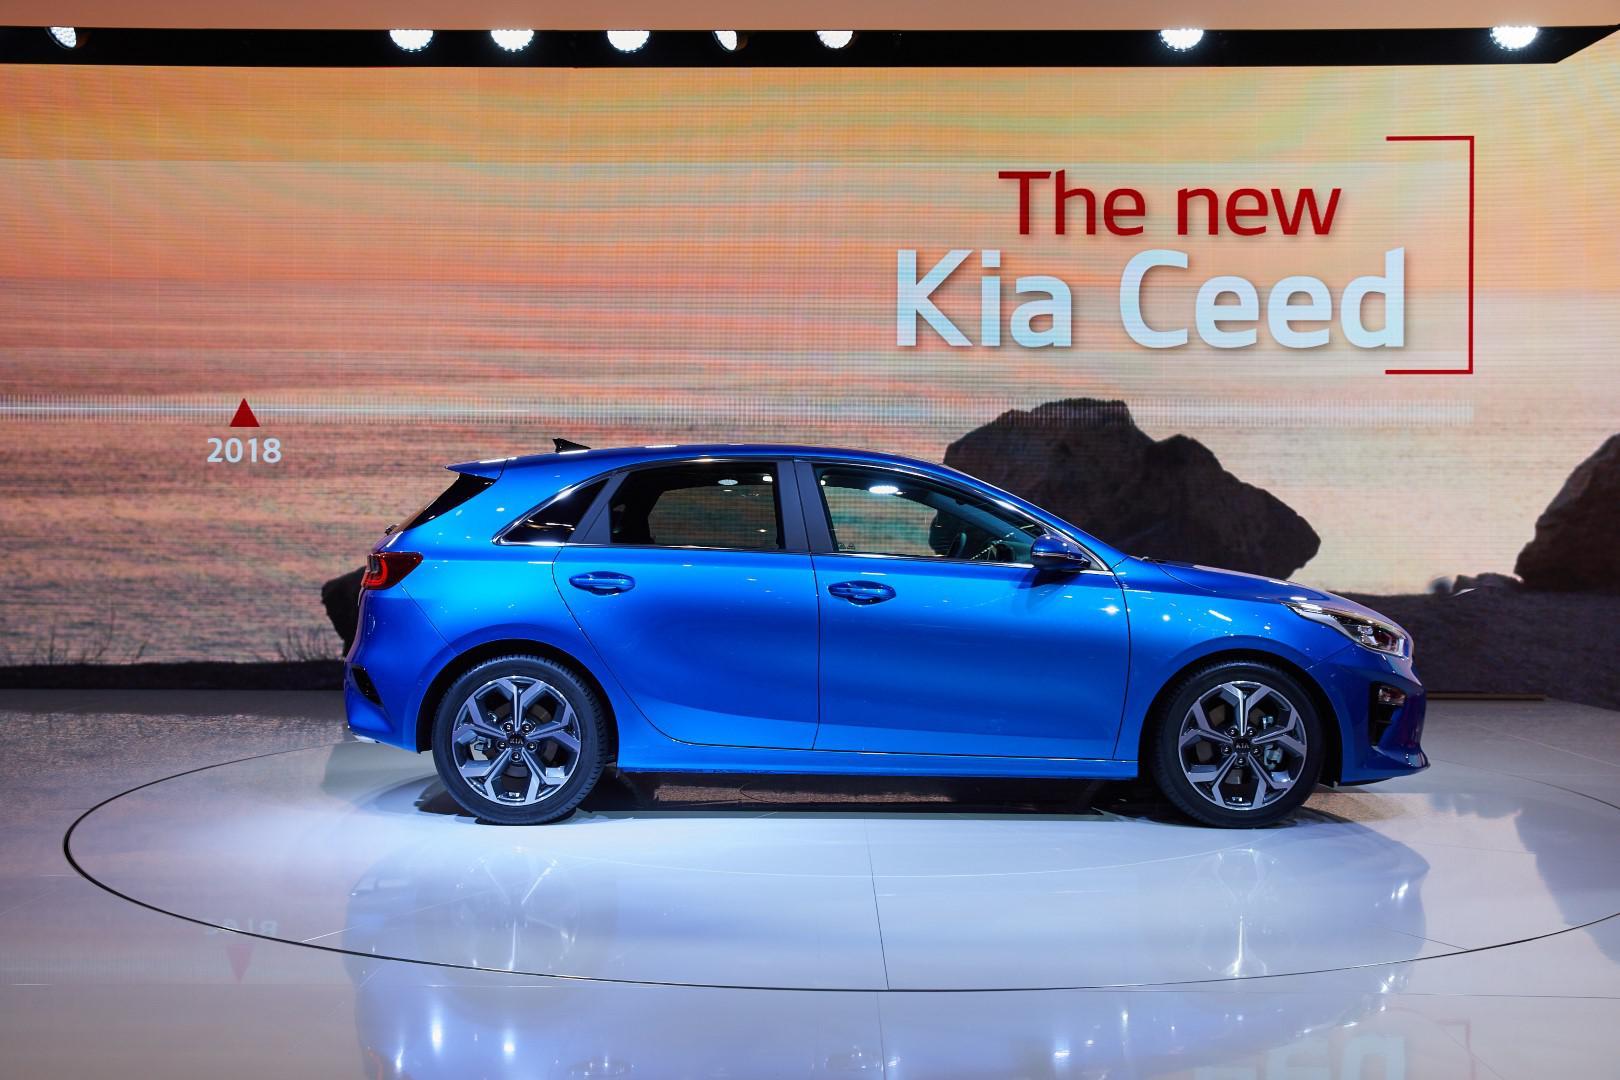 la-nouvelle-et-innovante-kia-ceed-made-in-europe-fait-ses-debuts-au-maroc-1094-1.jpg